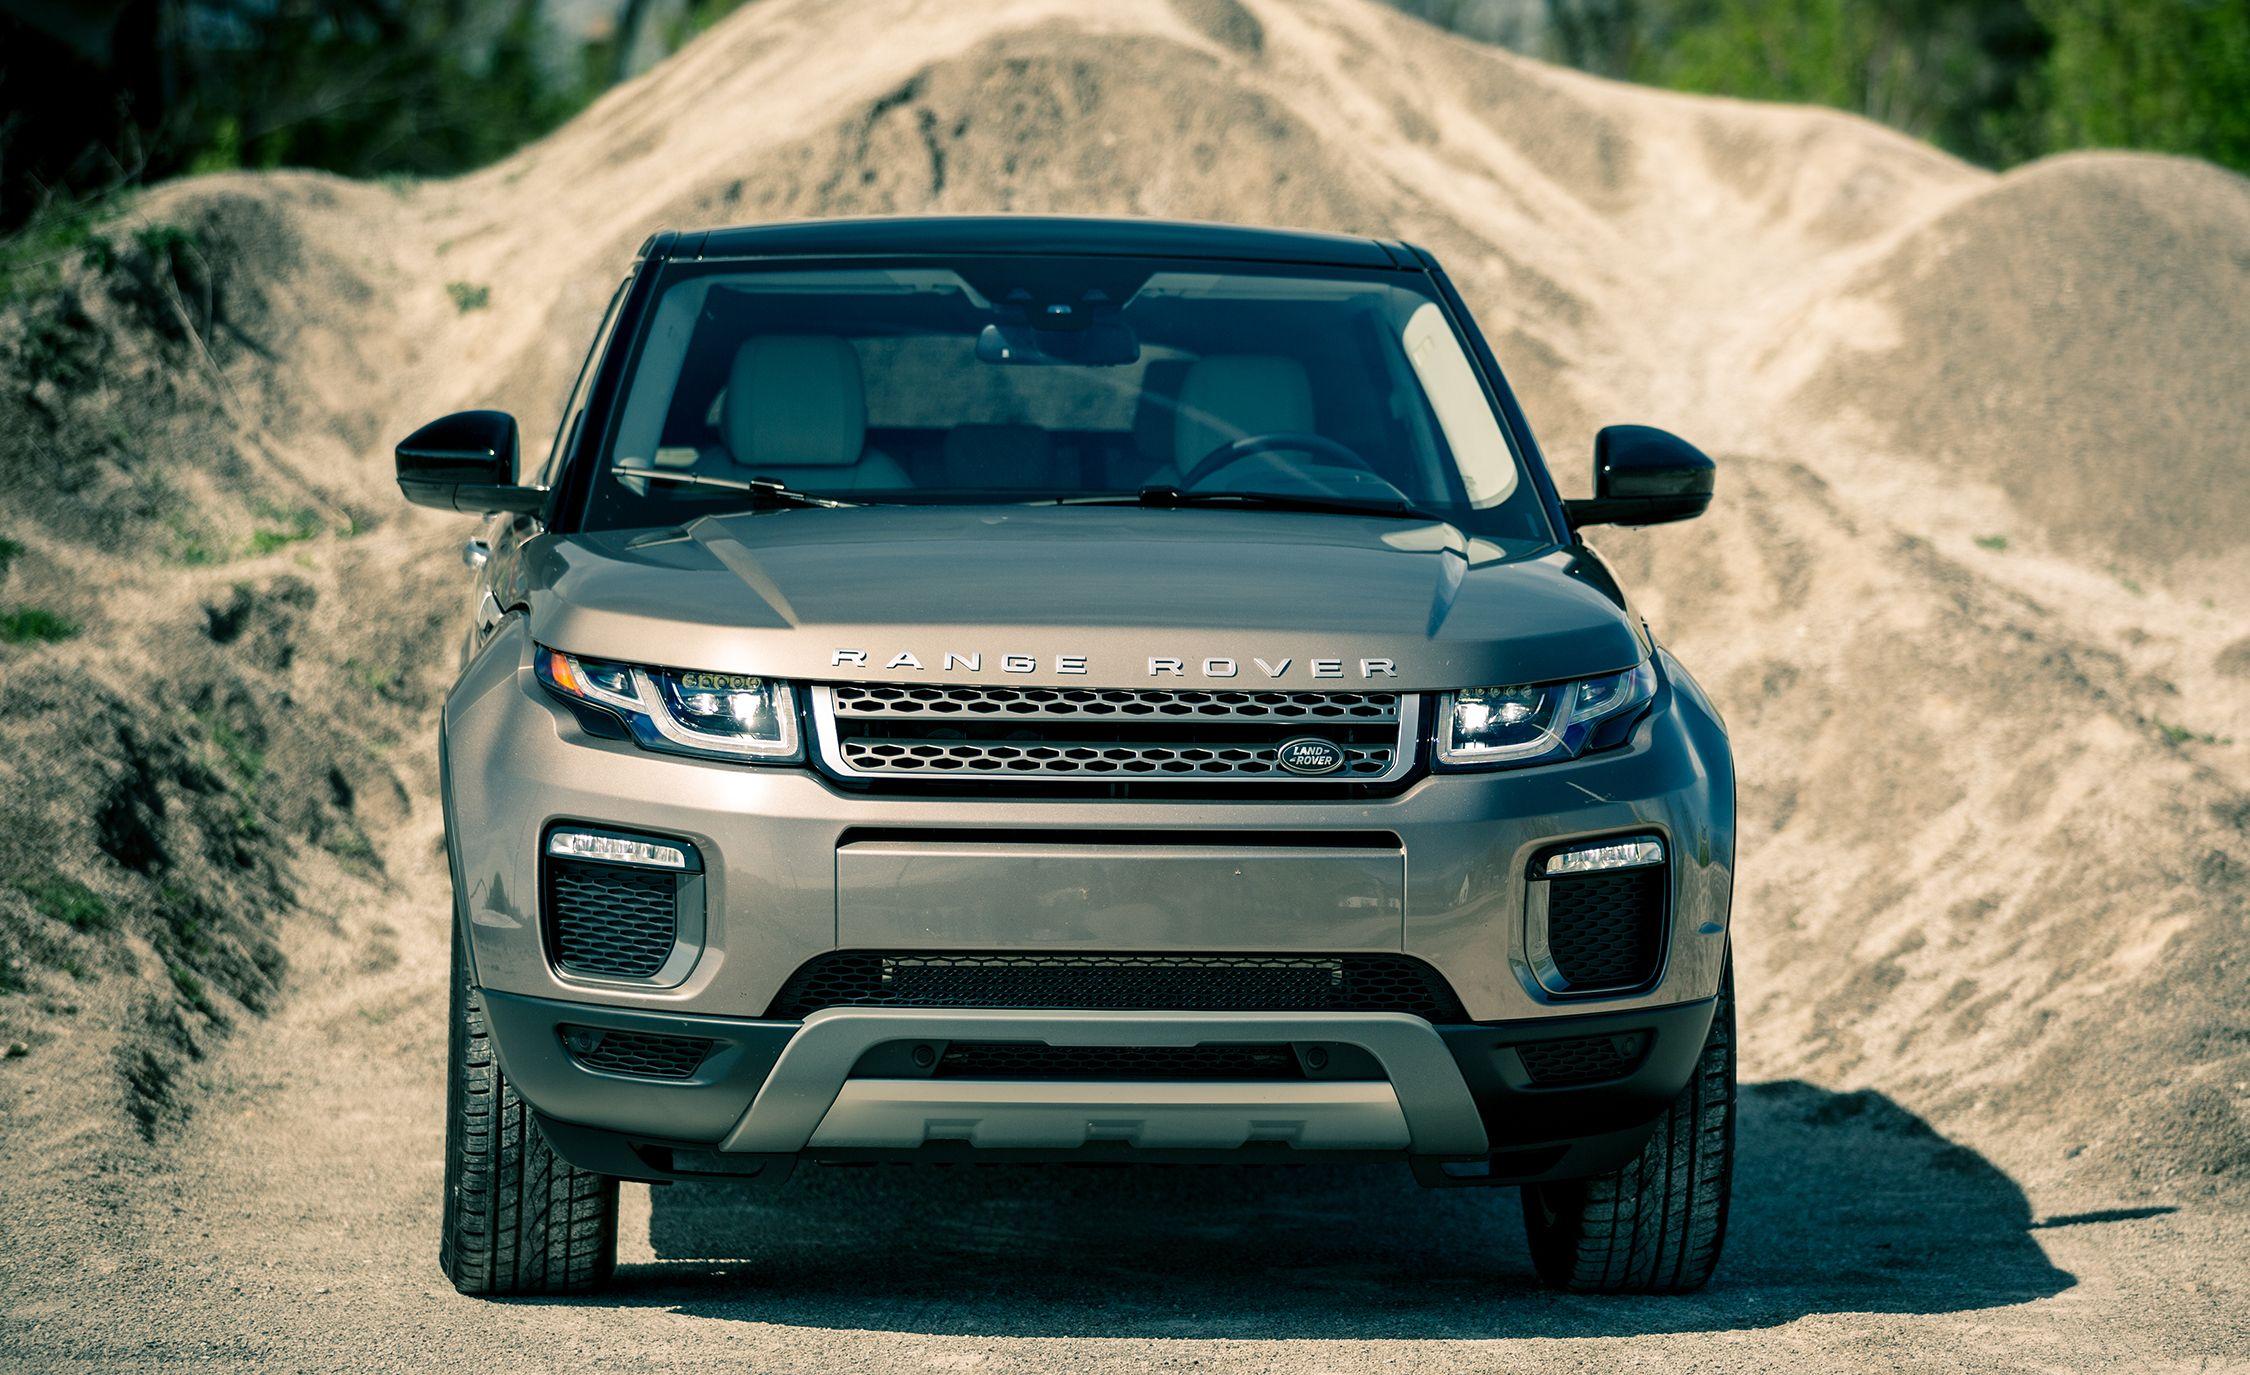 2017 land rover range rover evoque fuel economy review car and driver. Black Bedroom Furniture Sets. Home Design Ideas